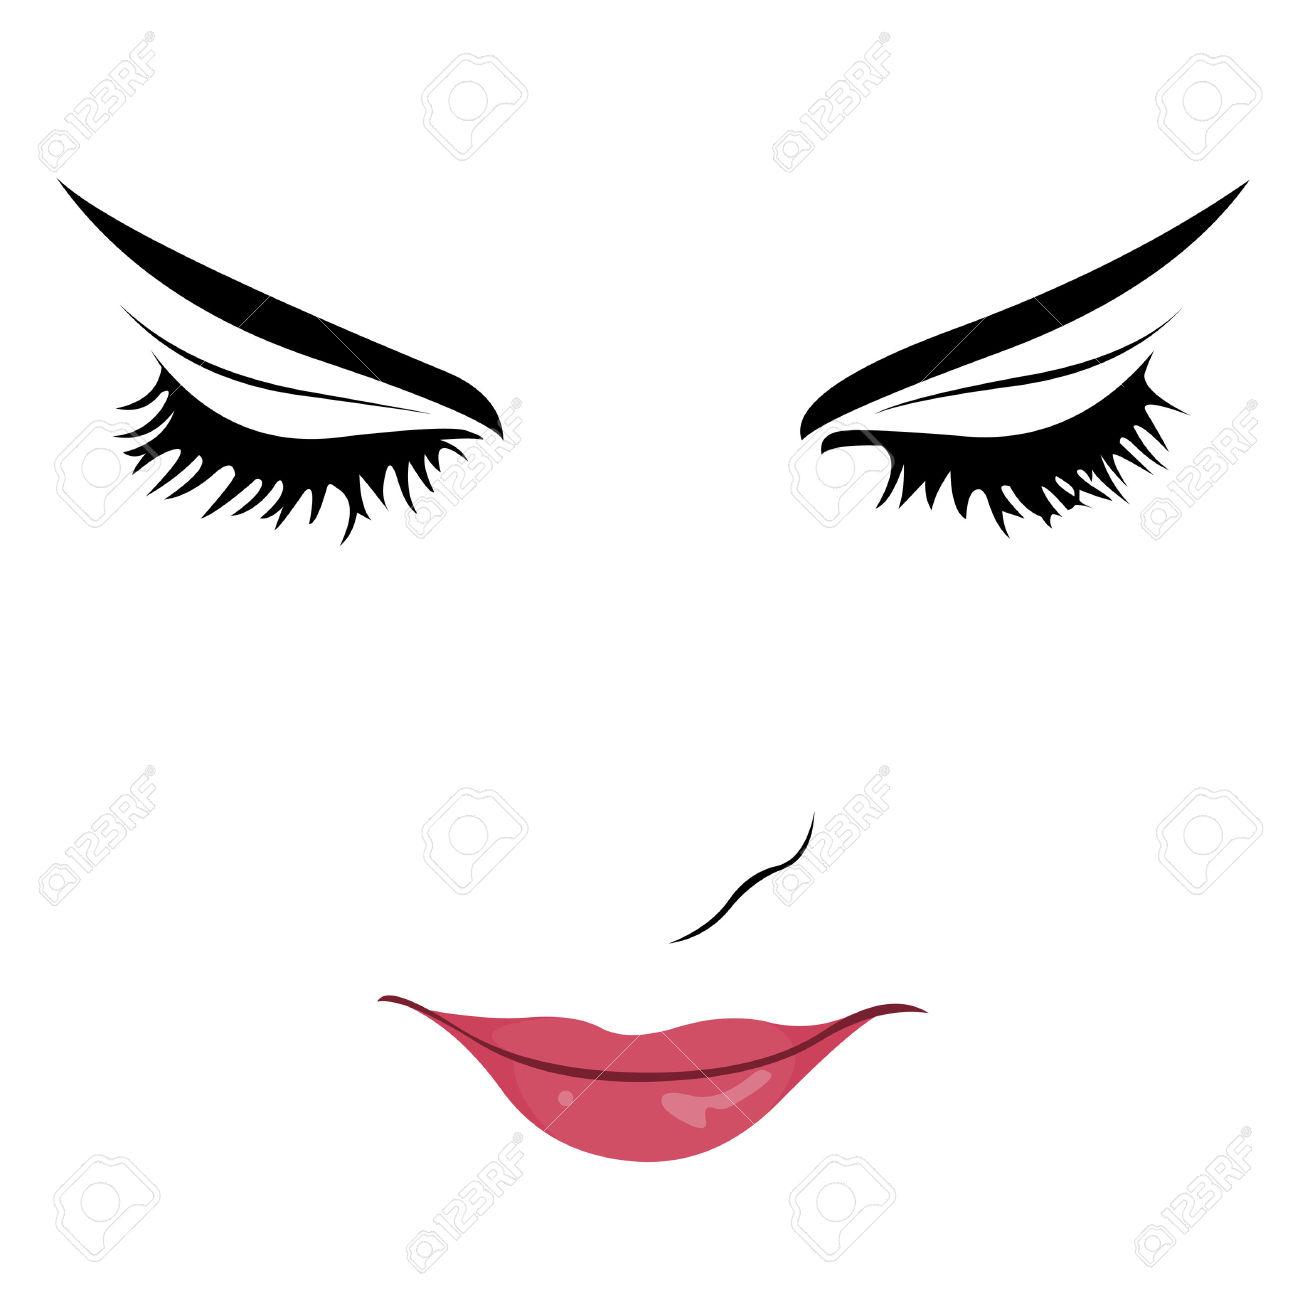 Beauty clipart pretty eye, Beauty pretty eye Transparent.